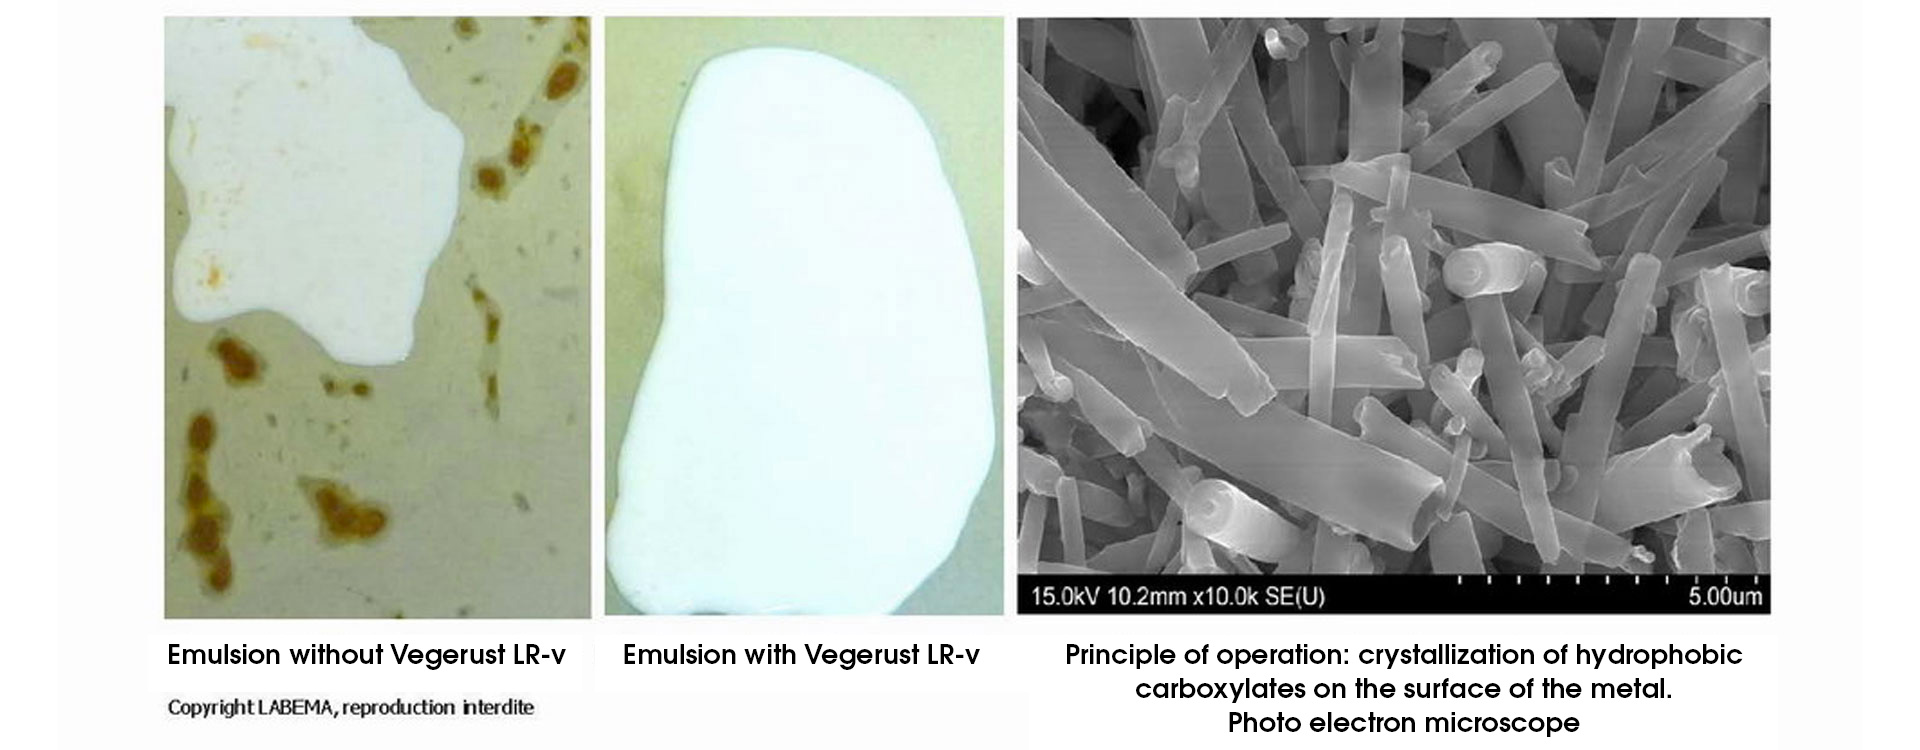 VEGERUST-LR-v-Labema-future-is-vegetal